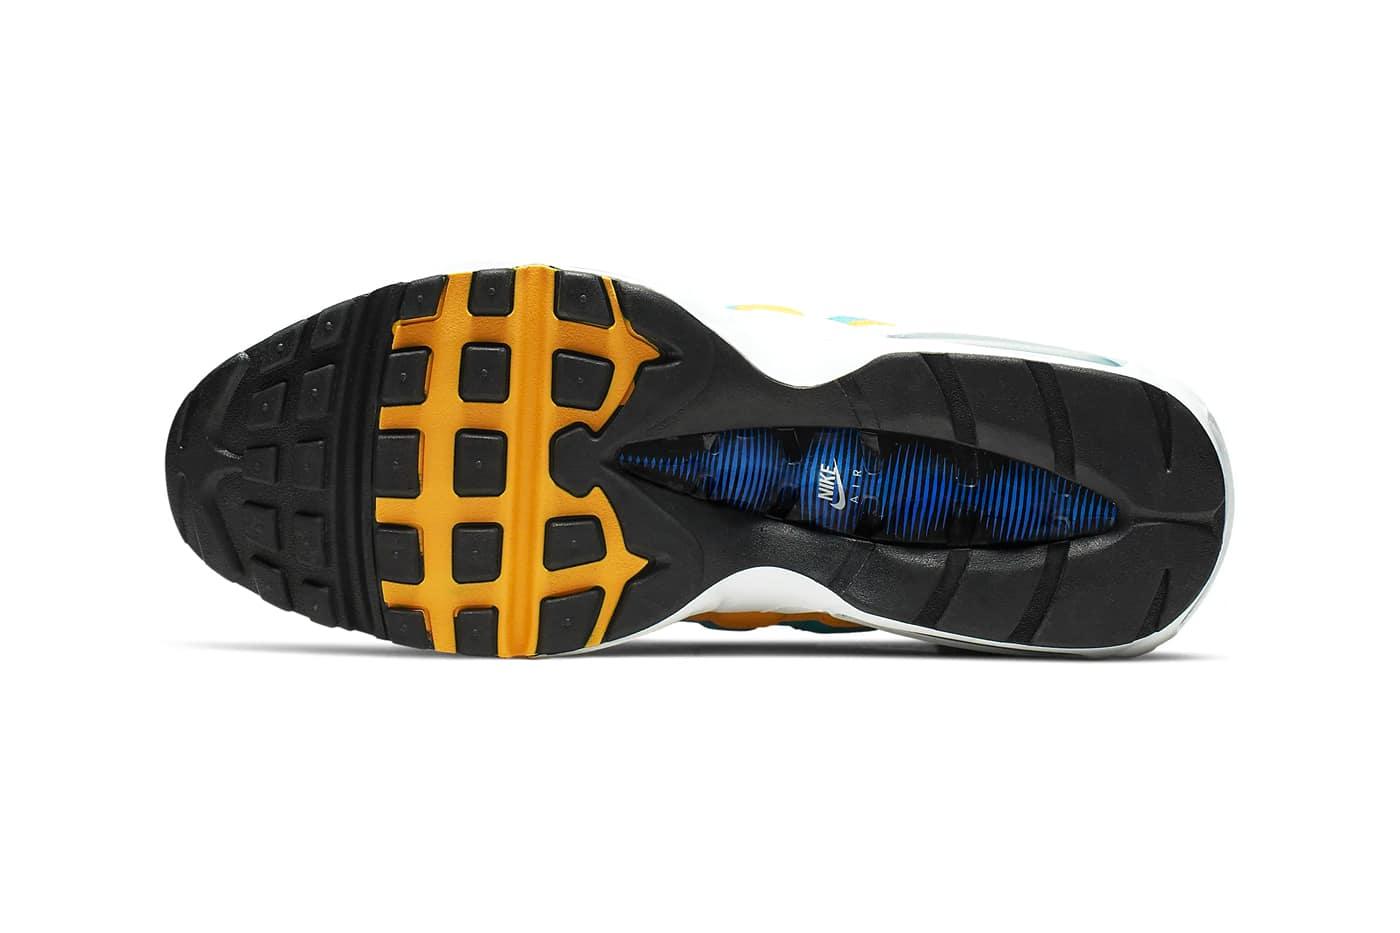 Windbreaker Nike Air Max 95 SE